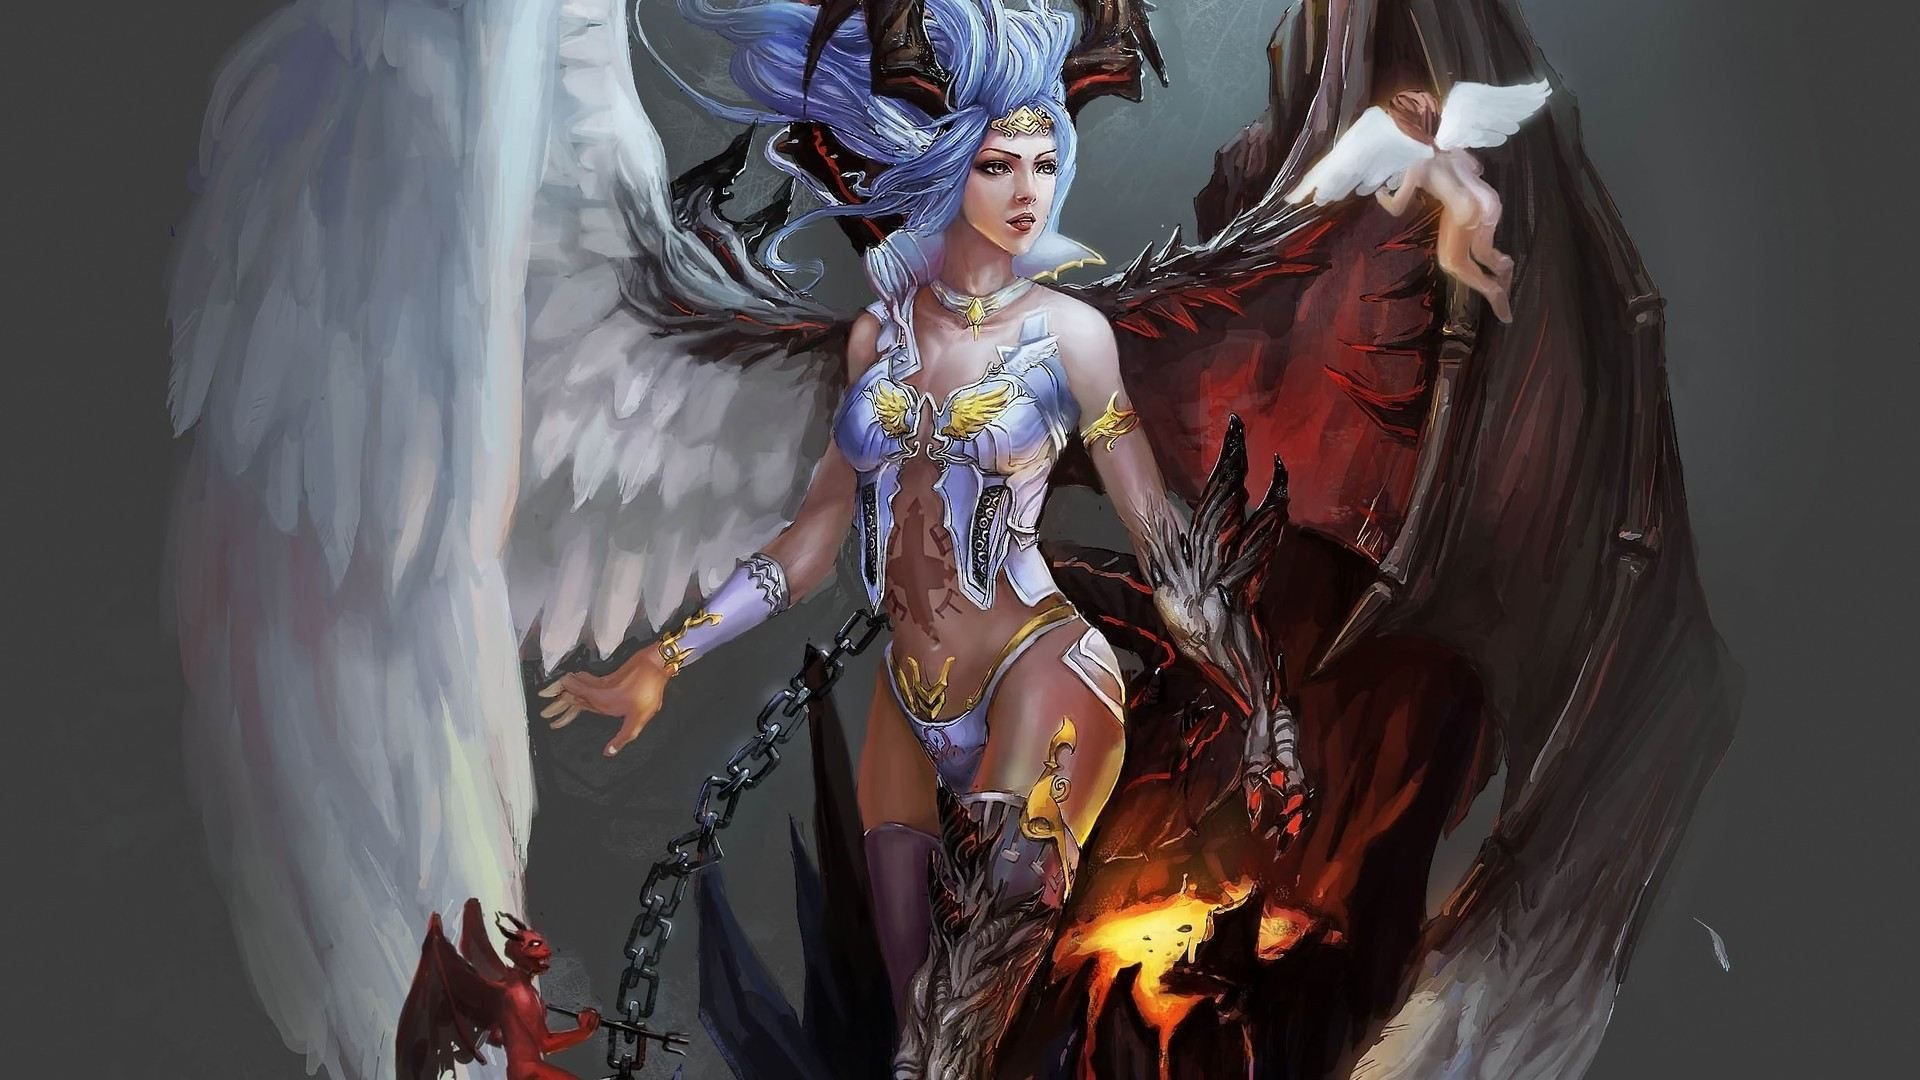 Angel and Demon | Full HD Desktop Wallpapers 1080p